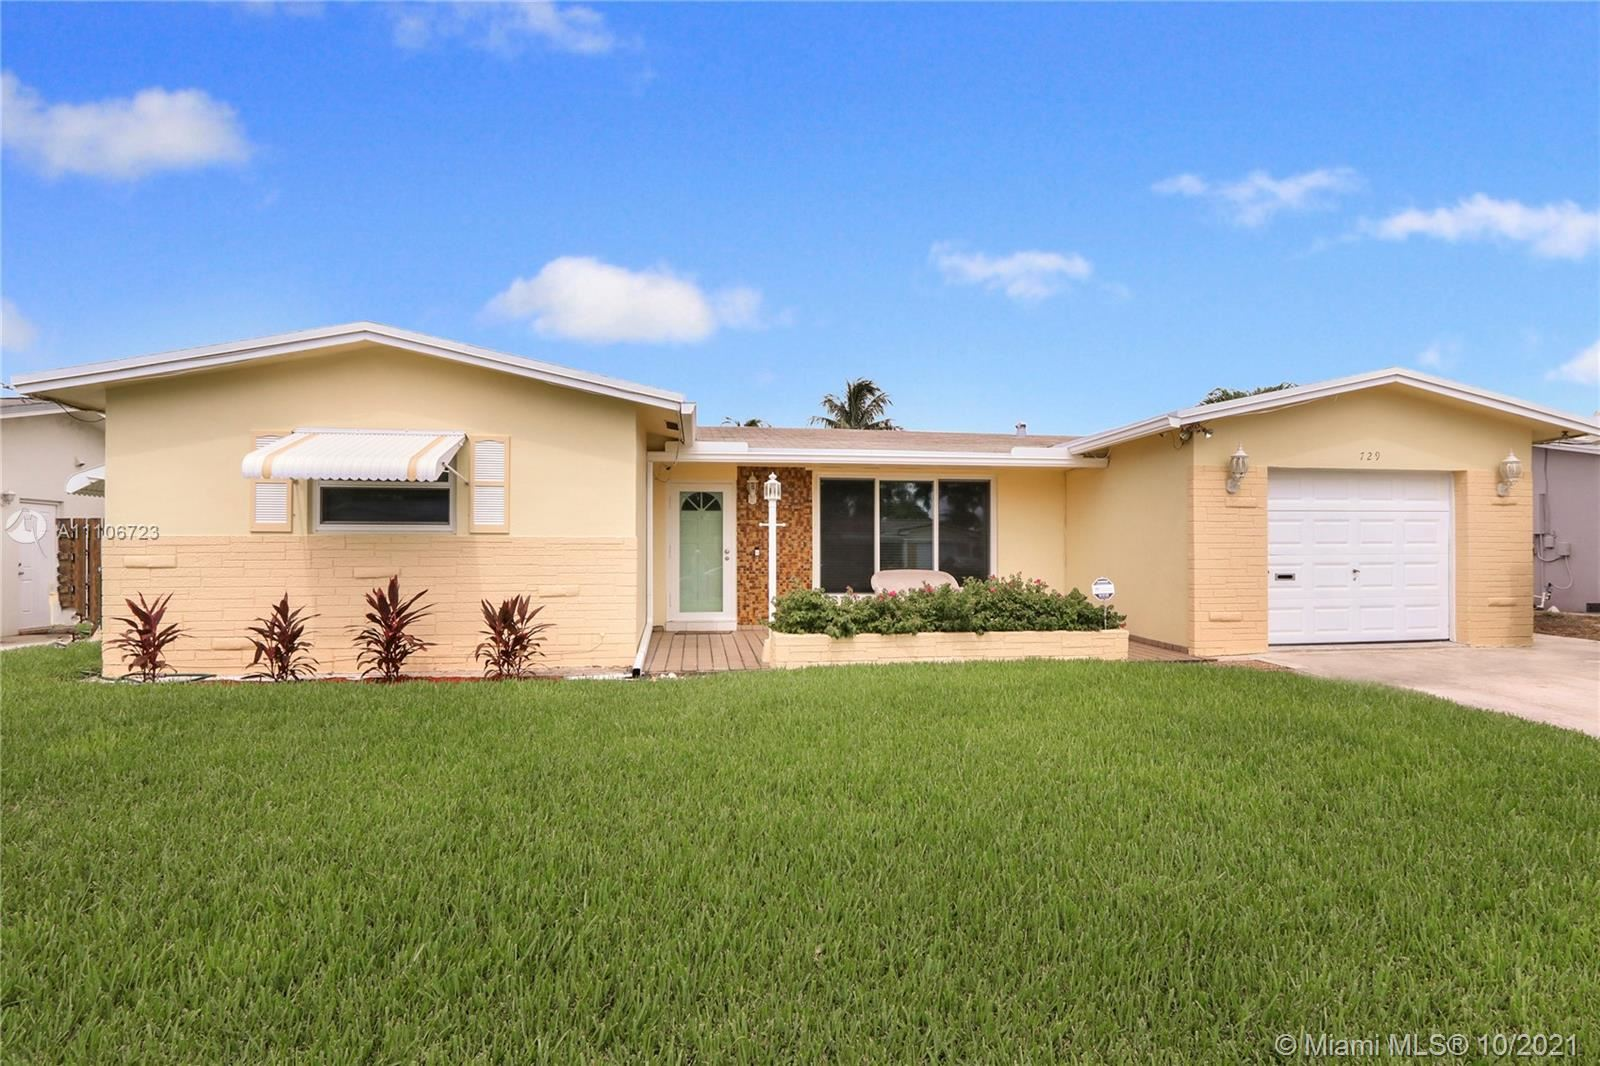 Photo of 729 NW 10th Ave, Dania Beach, FL 33004 (MLS # A11106723)